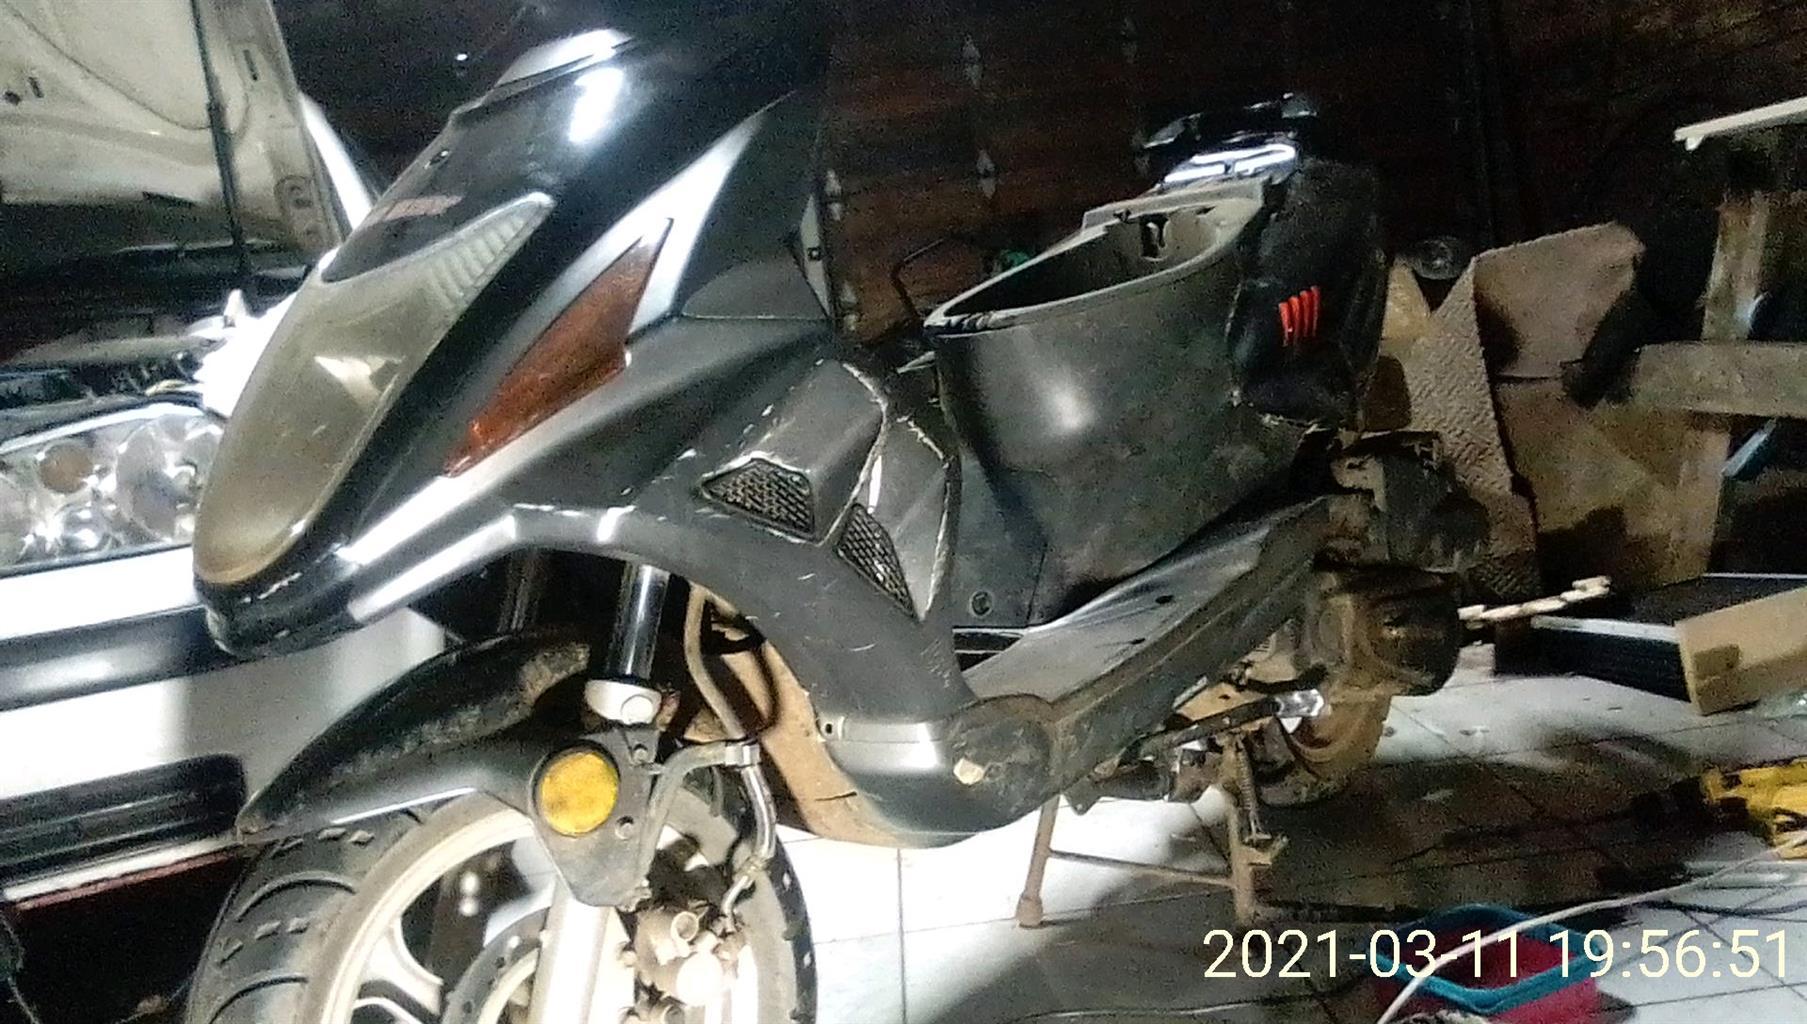 Big boy scooter 150cc